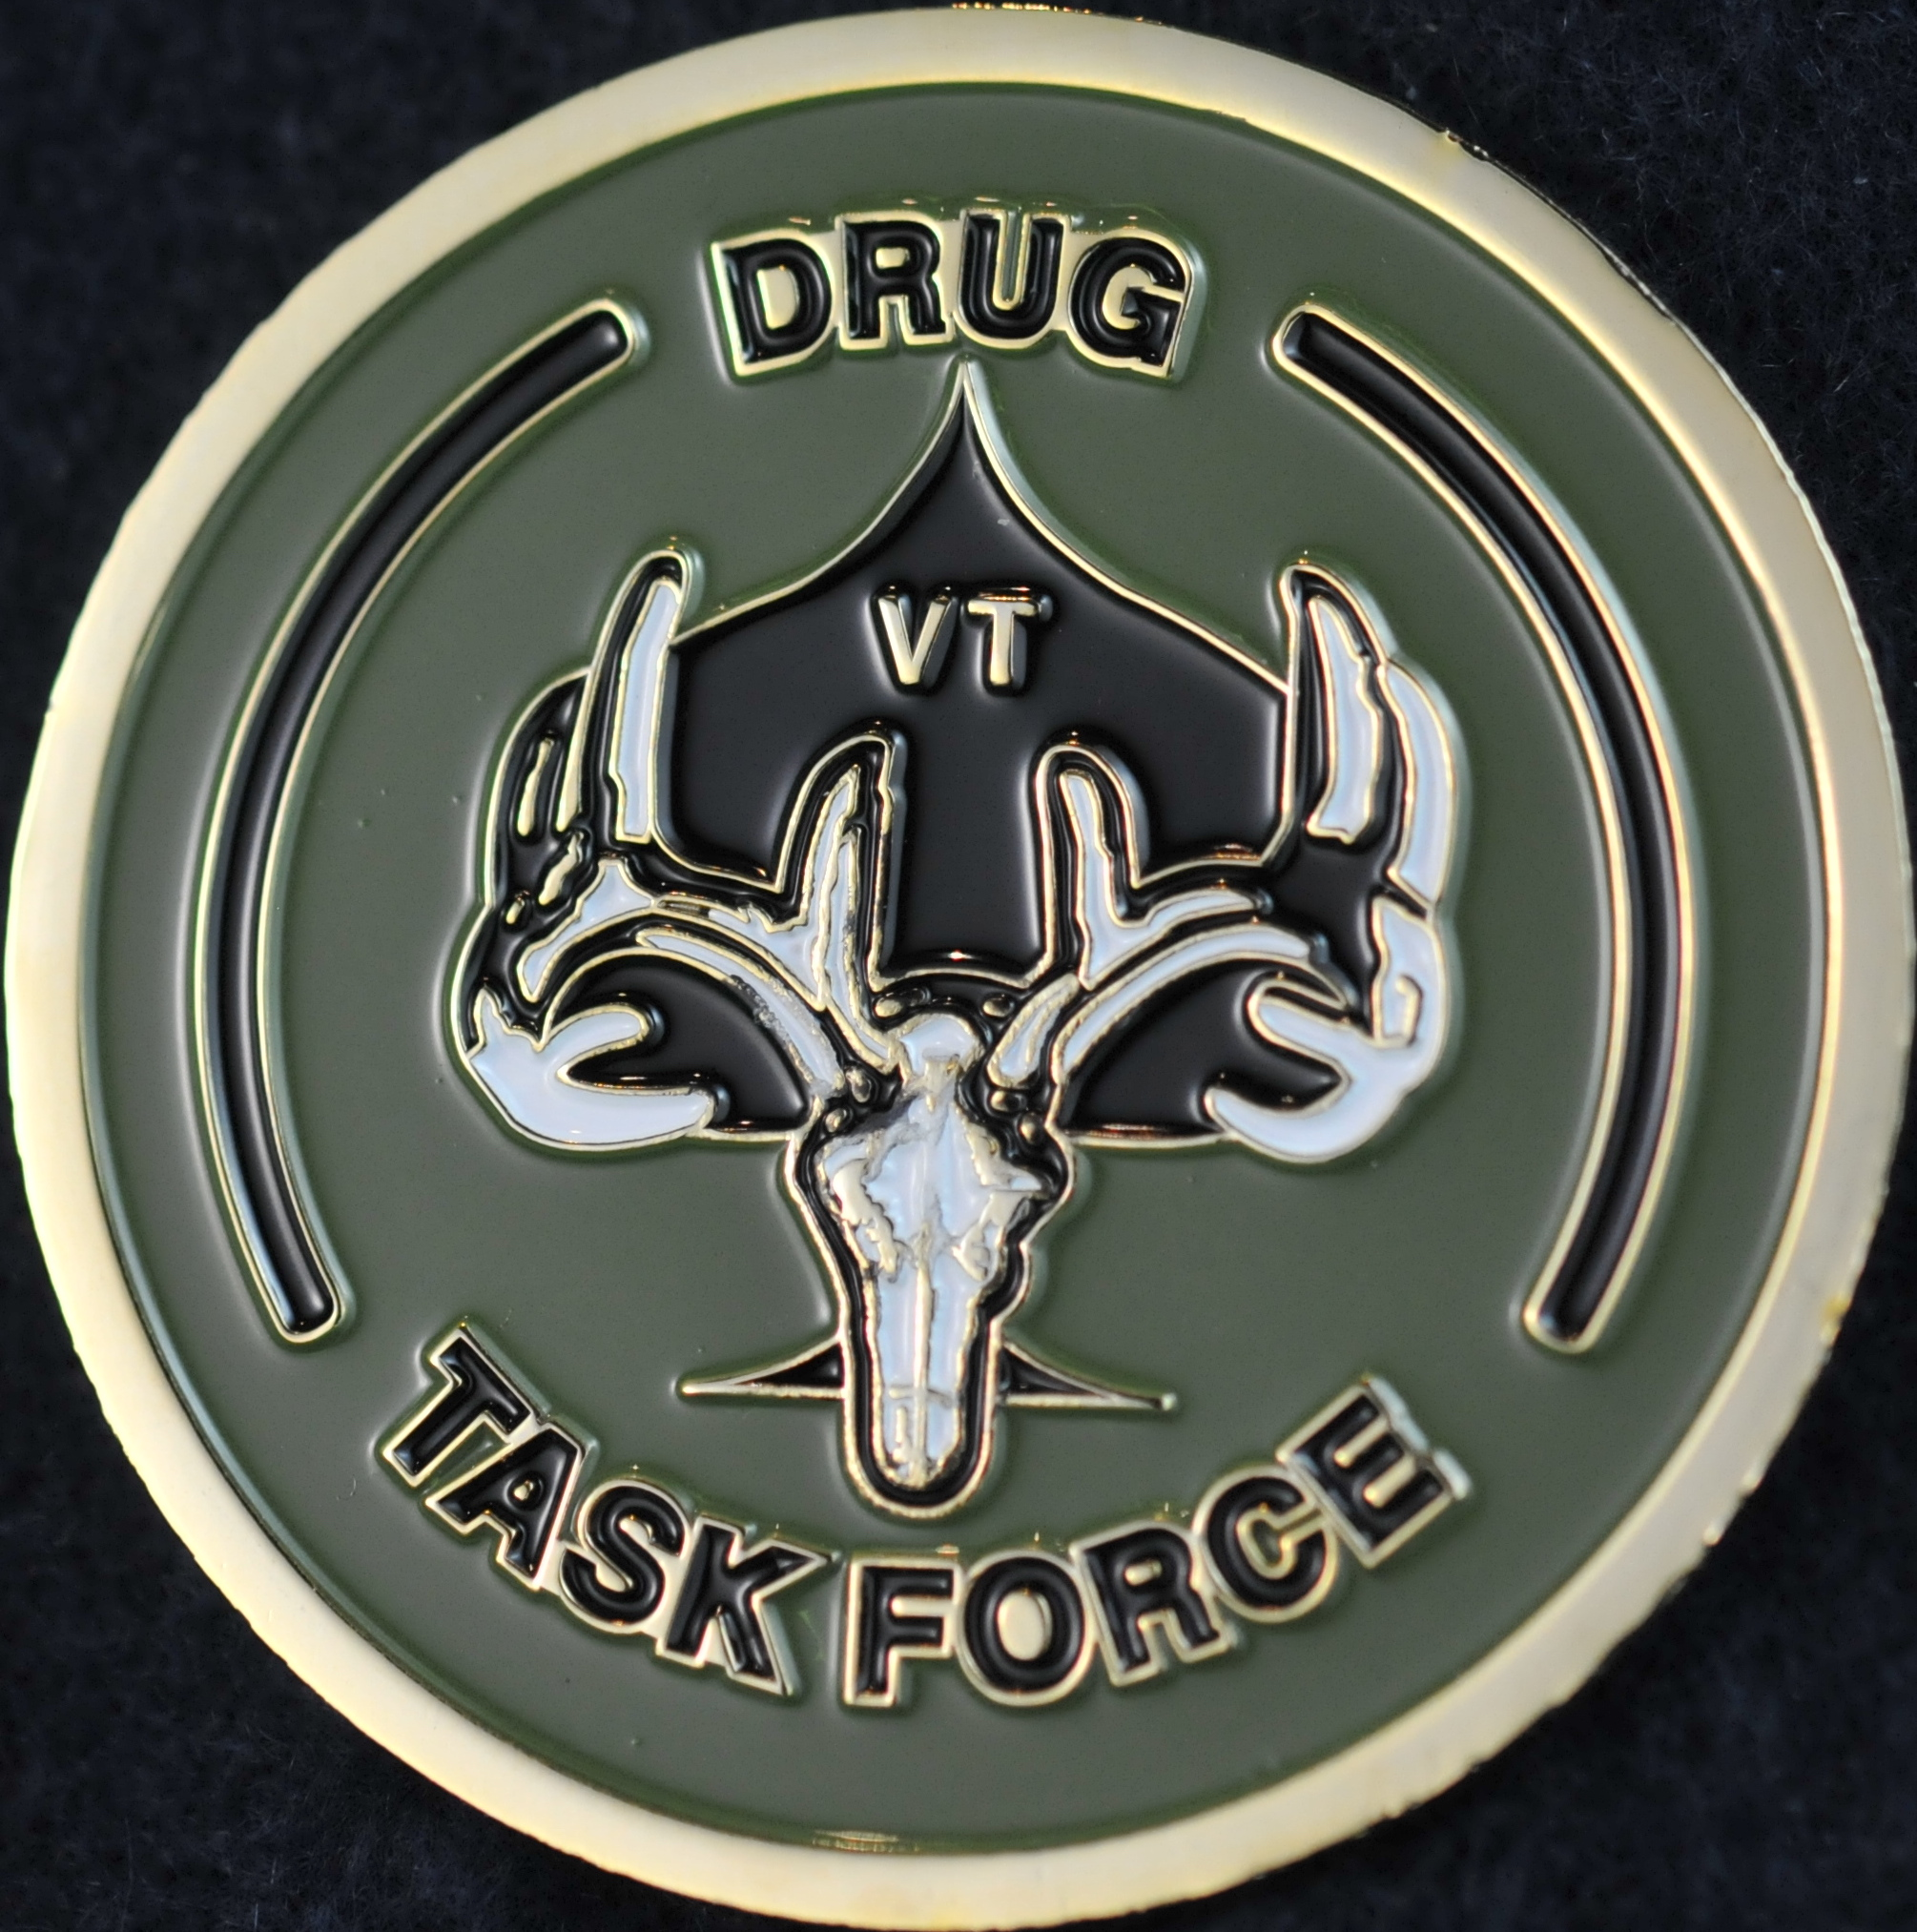 US ATF Vermont - Drug Task Force   Challengecoins ca